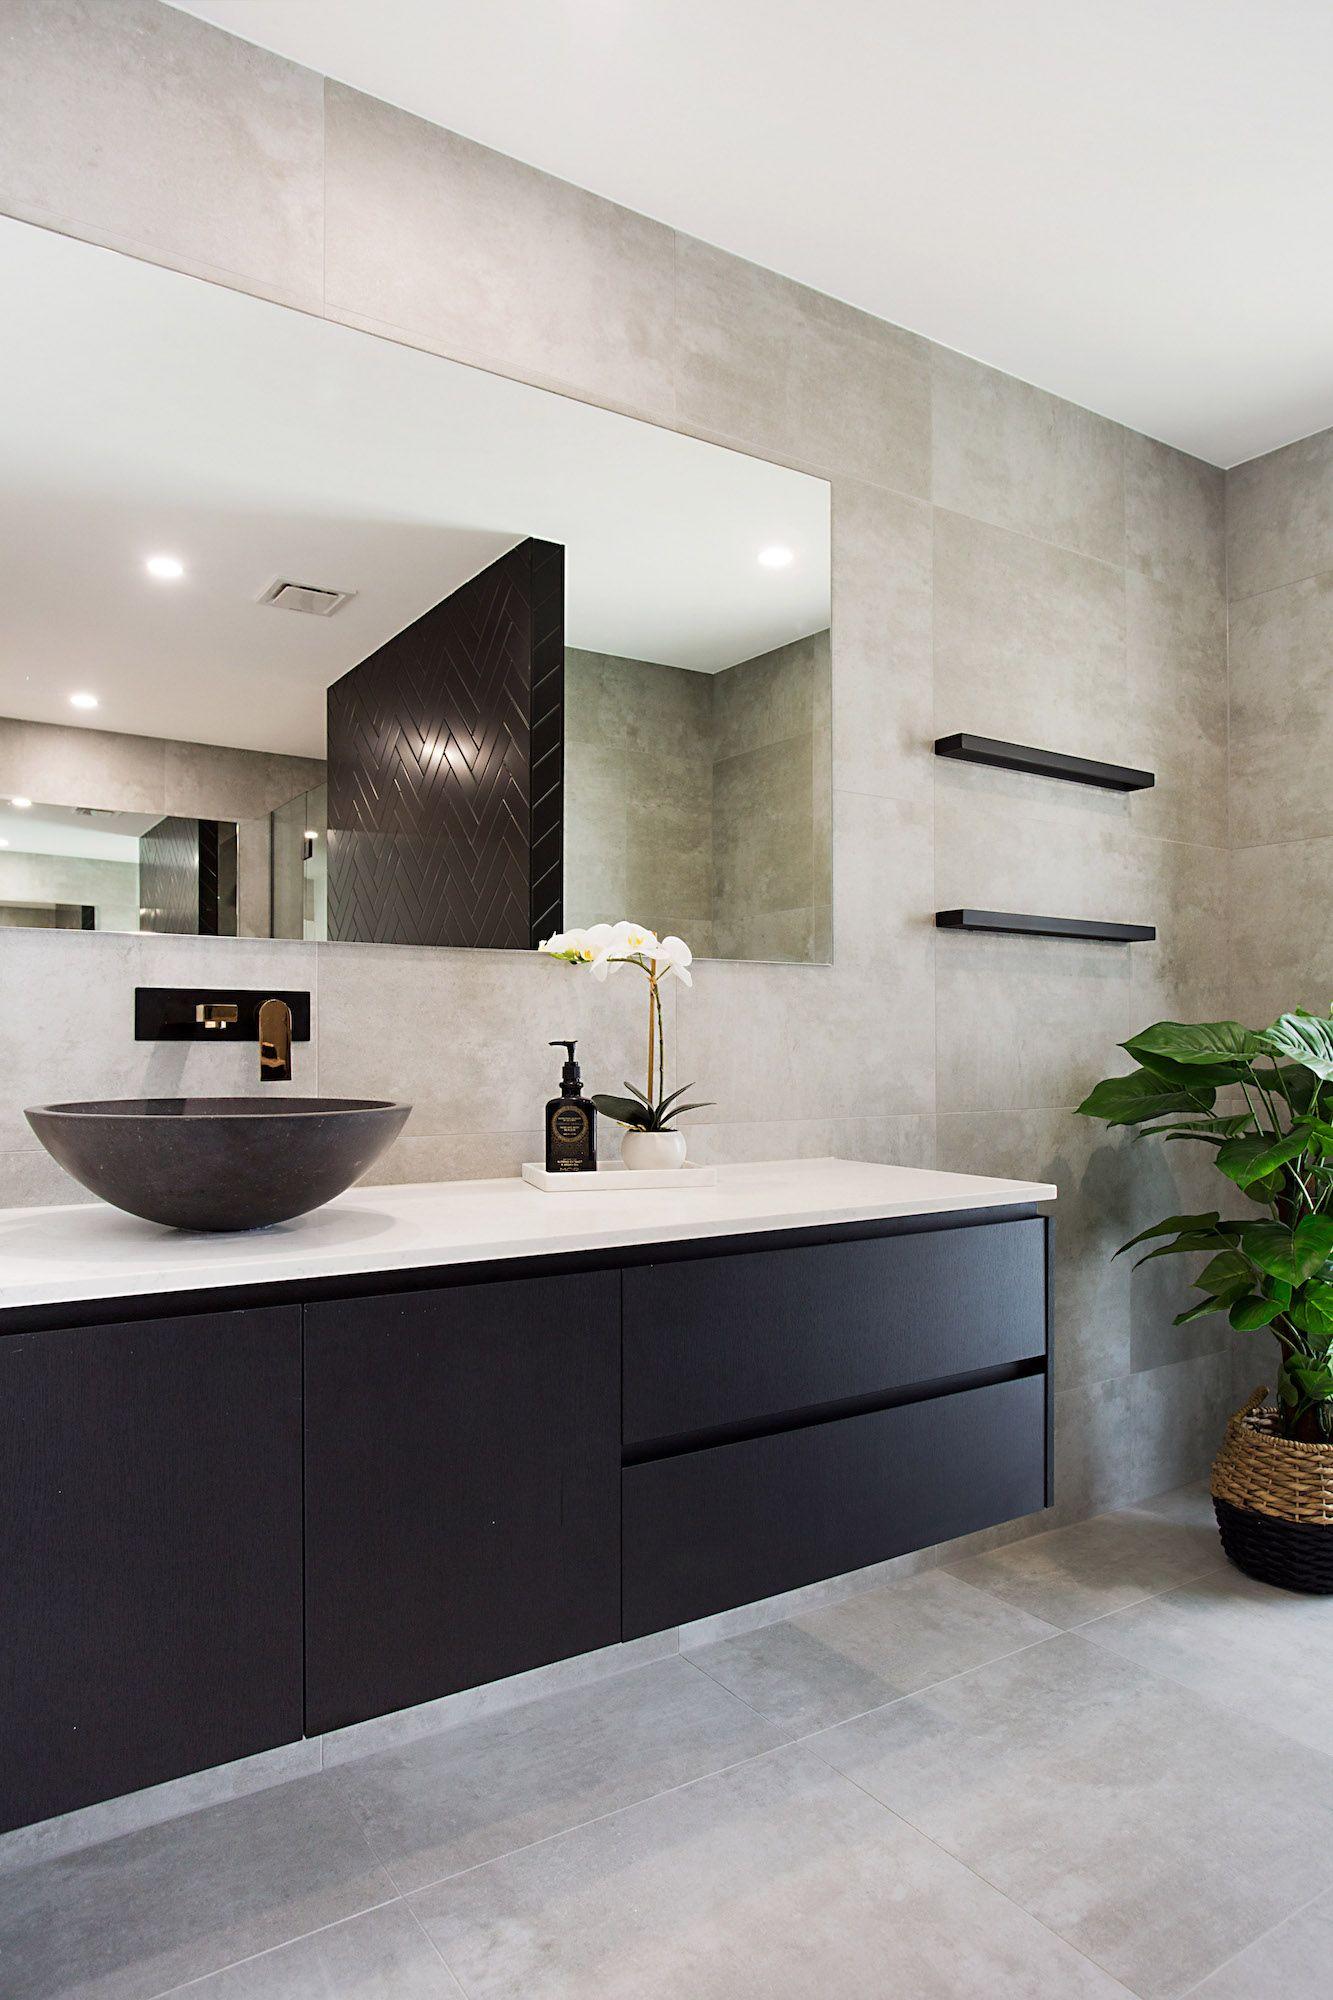 Modern Bathroom Using Concrete Tiles Bathroom Design Layout Concrete Bathroom Bathroom Interior Design